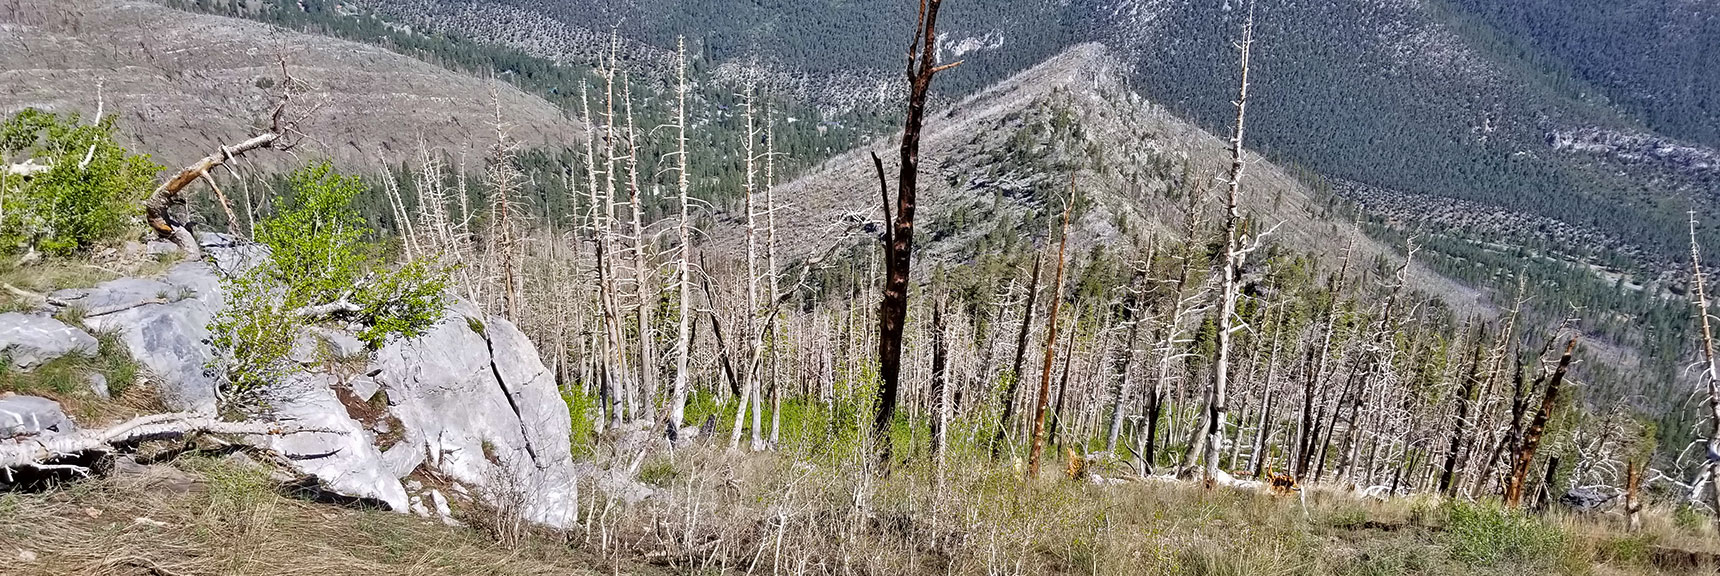 View Down Harris Mountain Approach Ridge | Harris Mountain Griffith Peak Circuit in Mt. Charleston Wilderness, Nevada